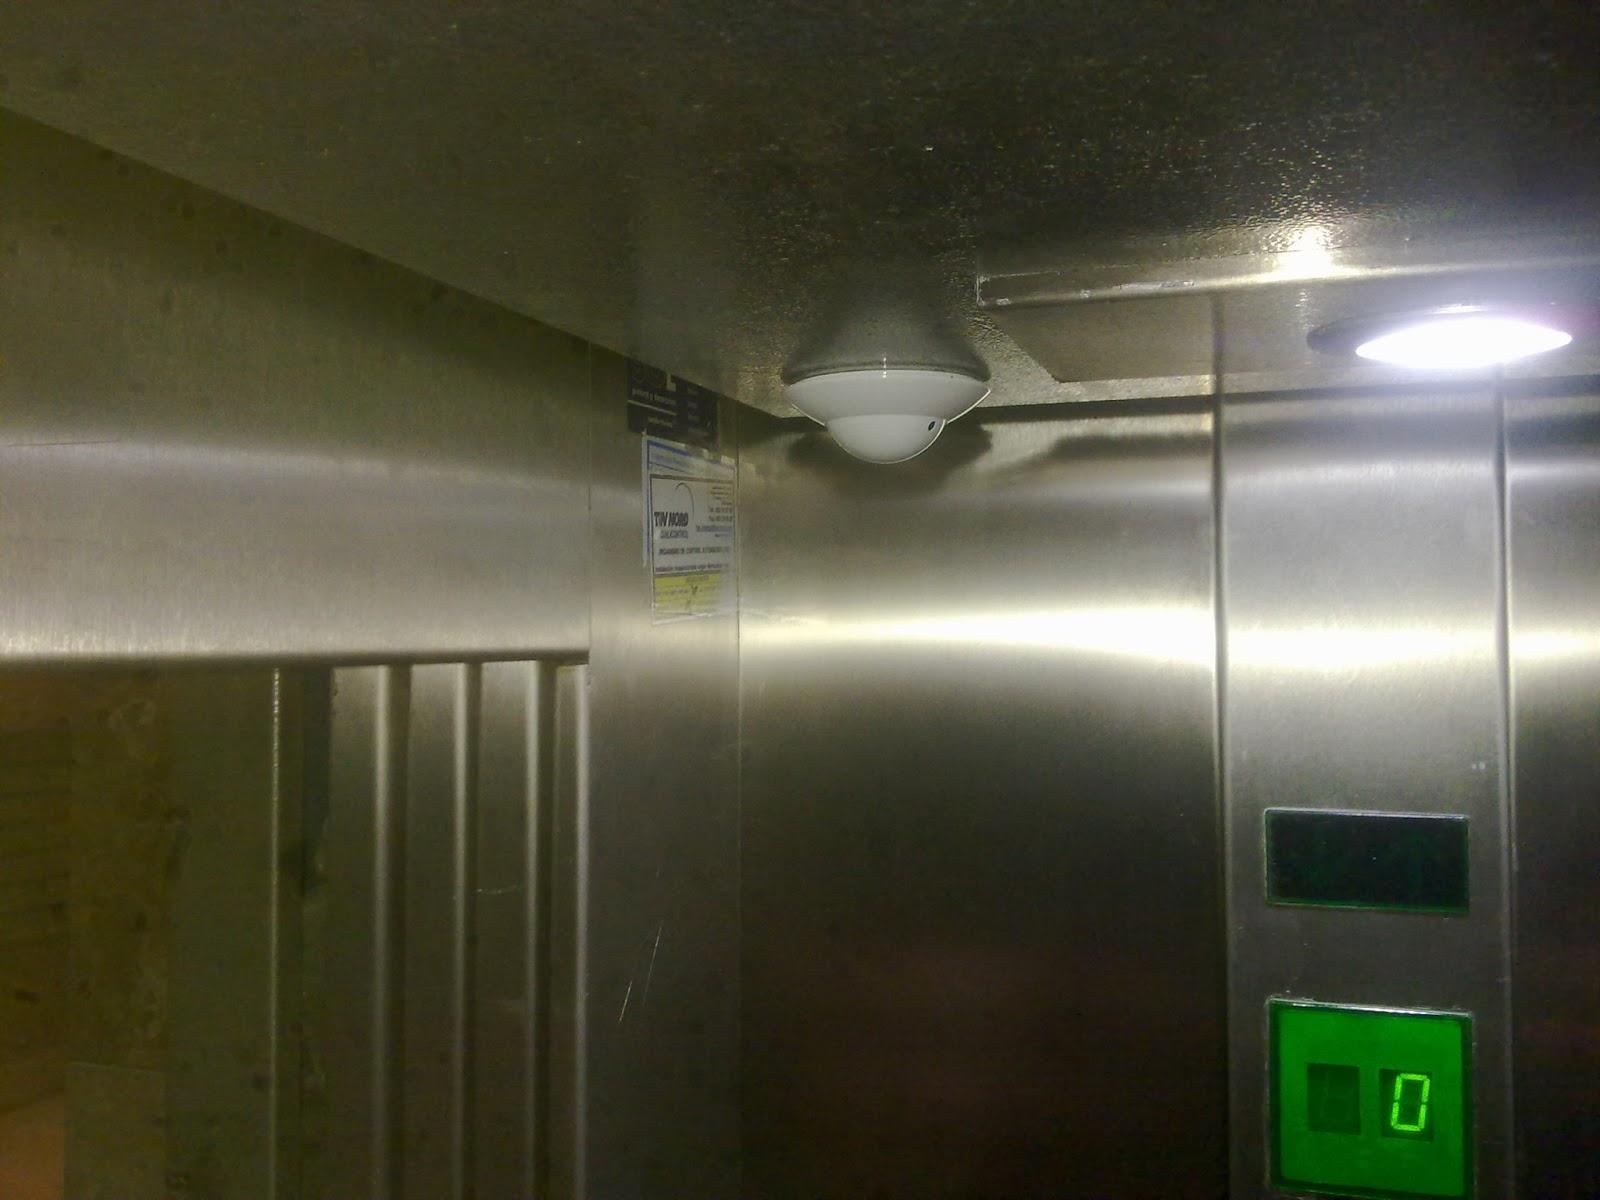 Grupo tecnovision m laga instalaci n de c maras de v deo - Precio instalacion ascensor ...